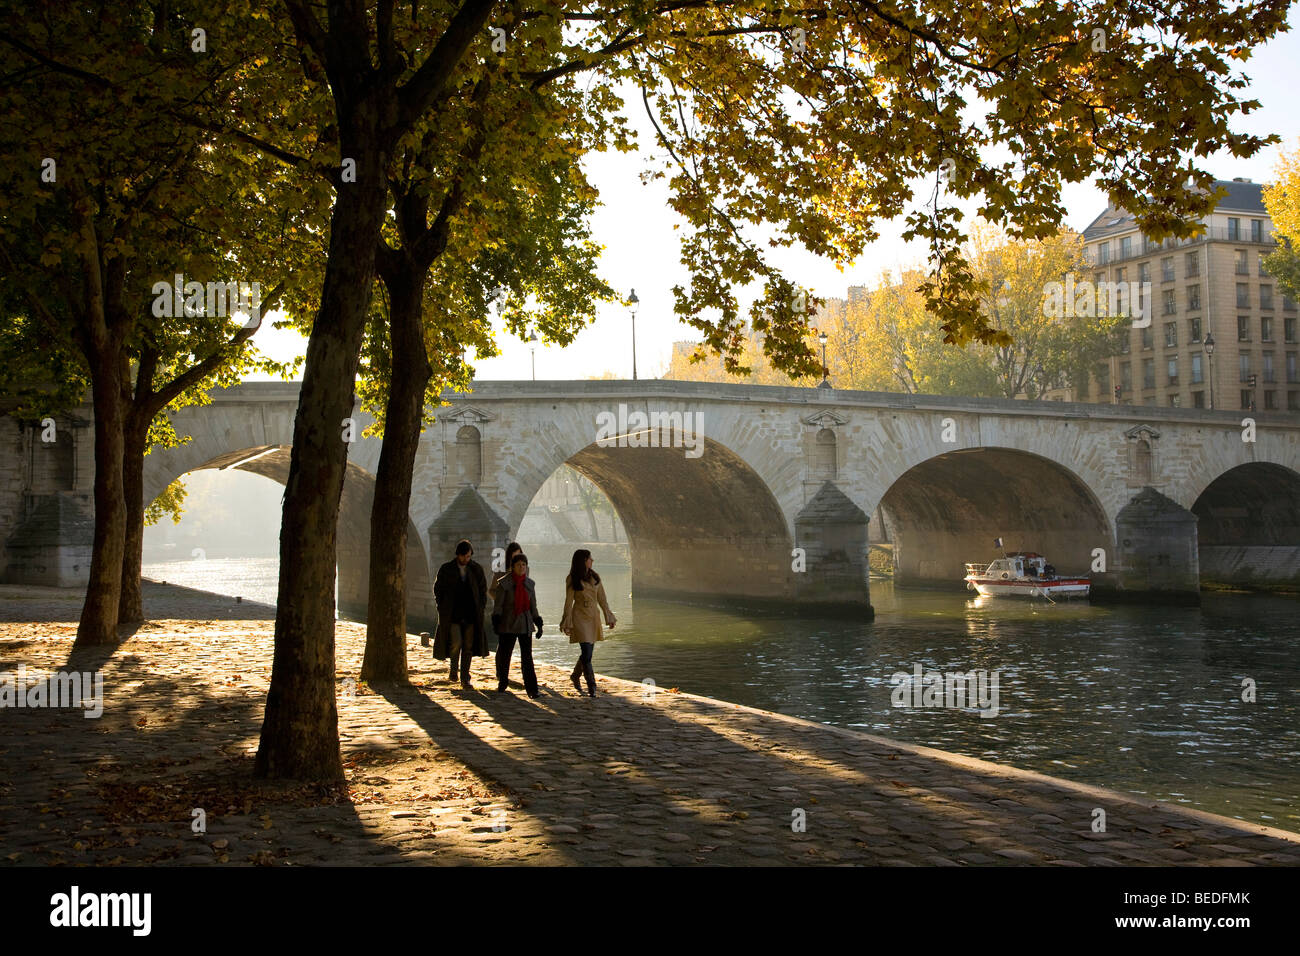 PONT MARIE BRIDGE AND QUAY SIDE, PARIS - Stock Image